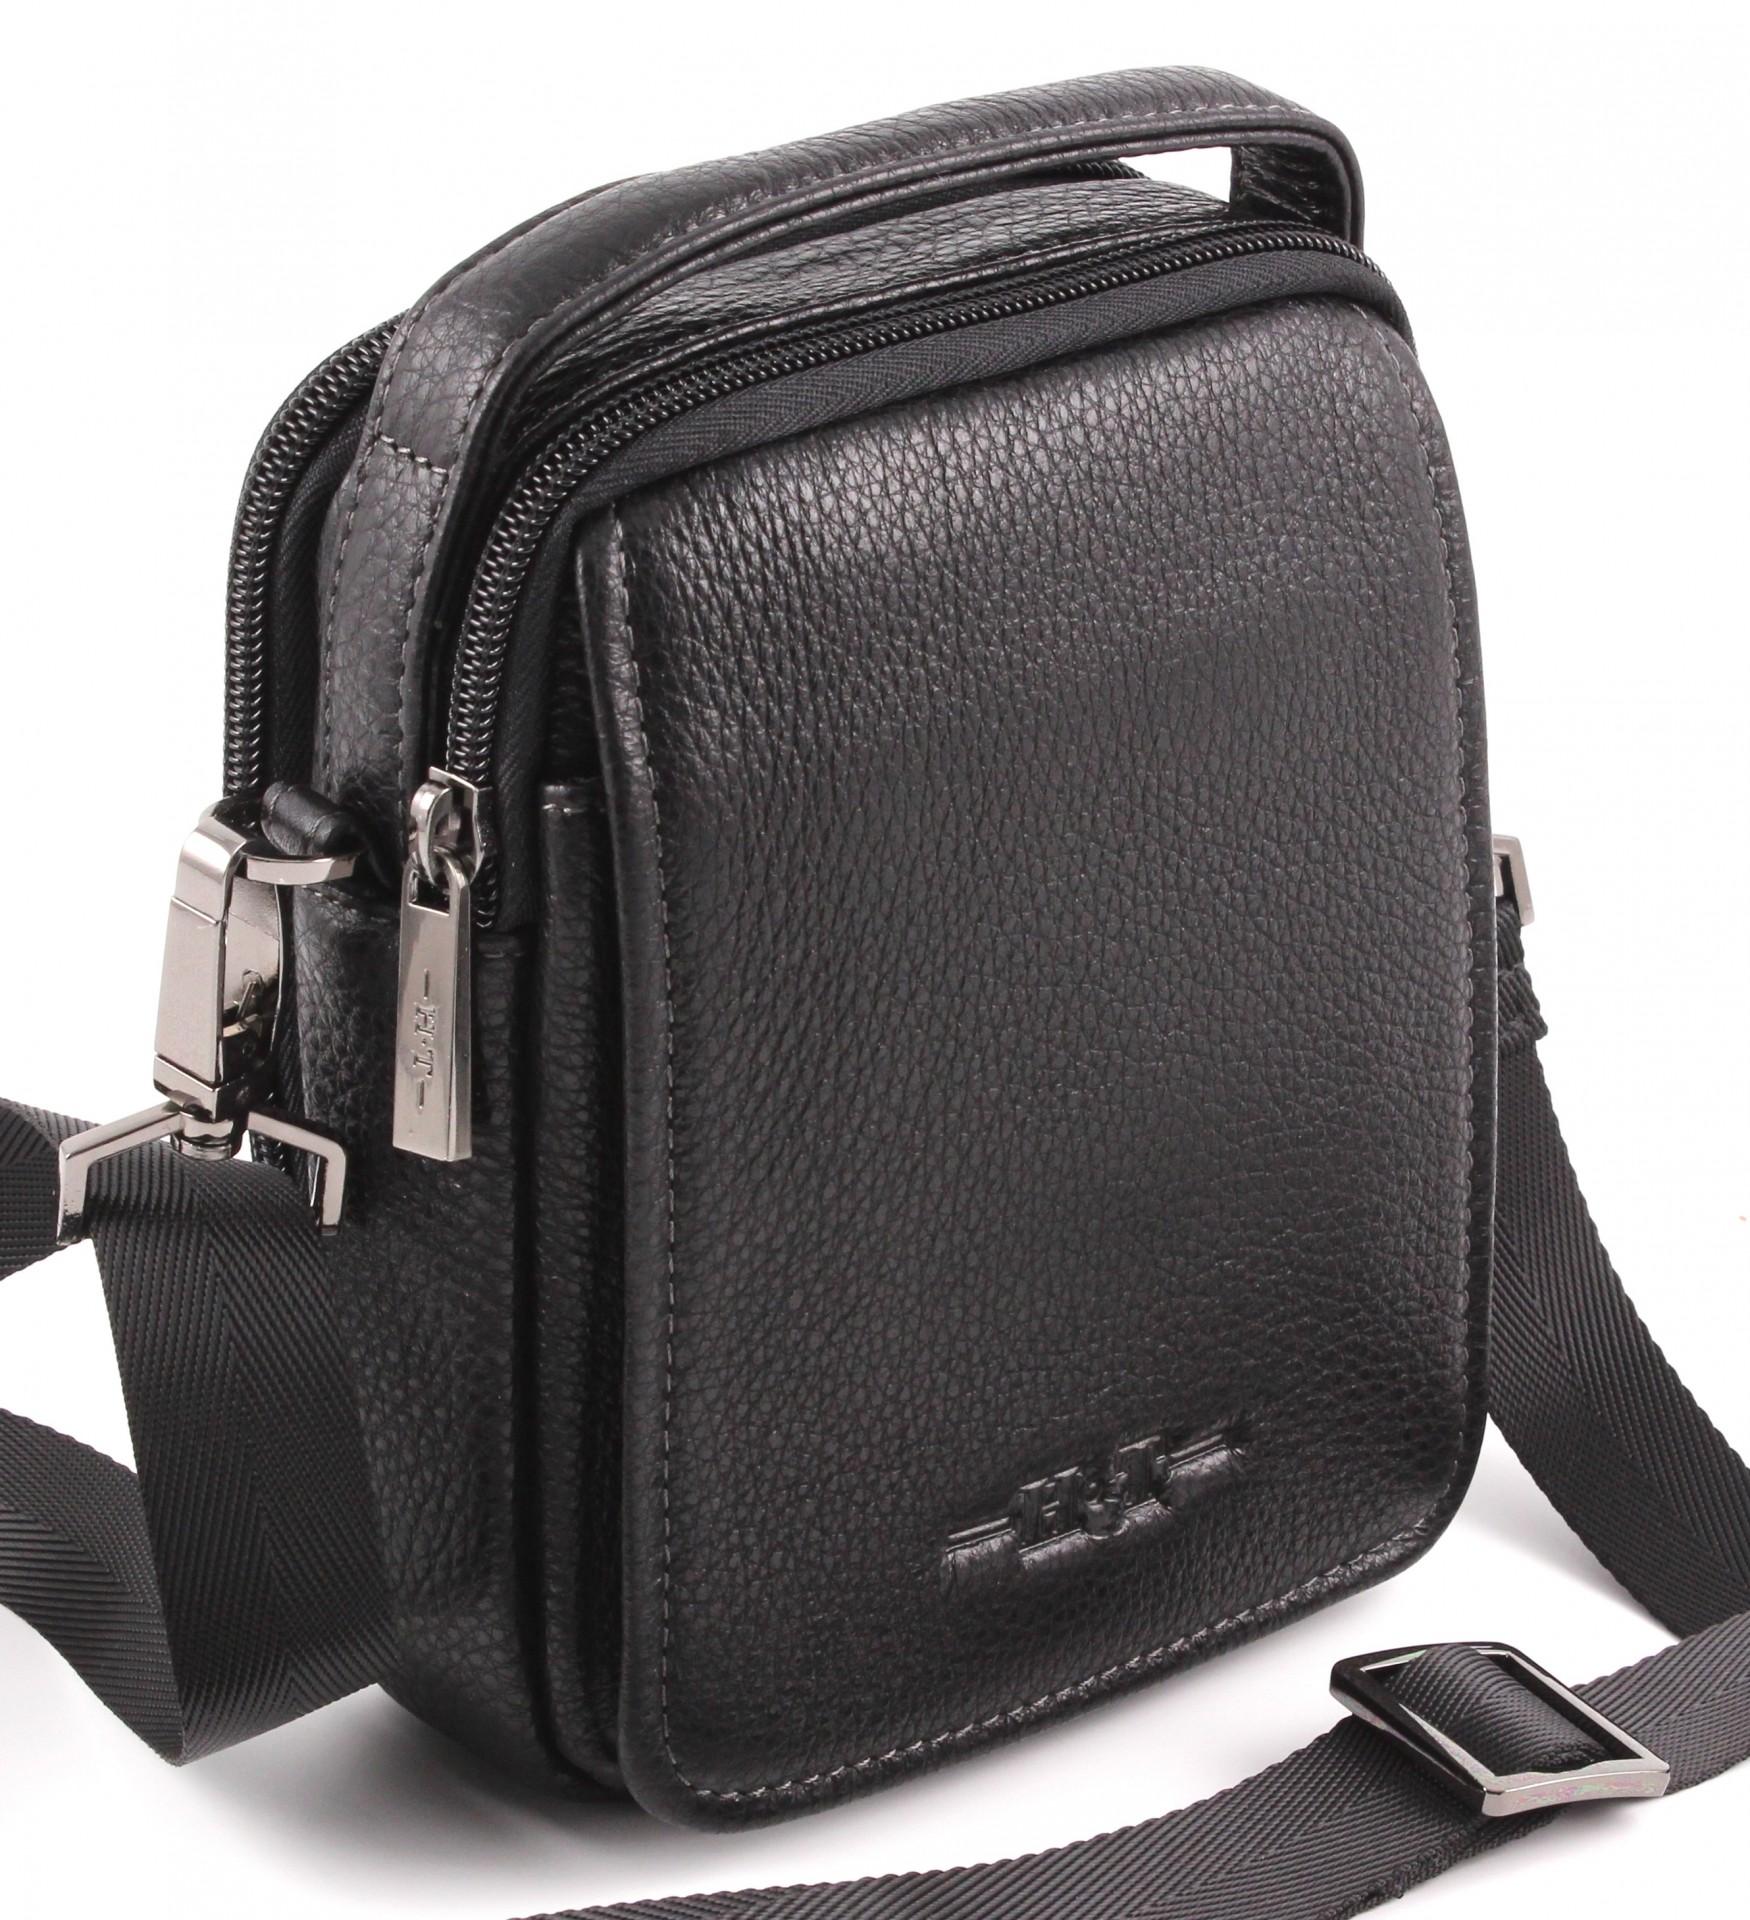 a823898529e2 Маленькая мужская поясная сумочка из натуральной кожи H.T Leather (10004)